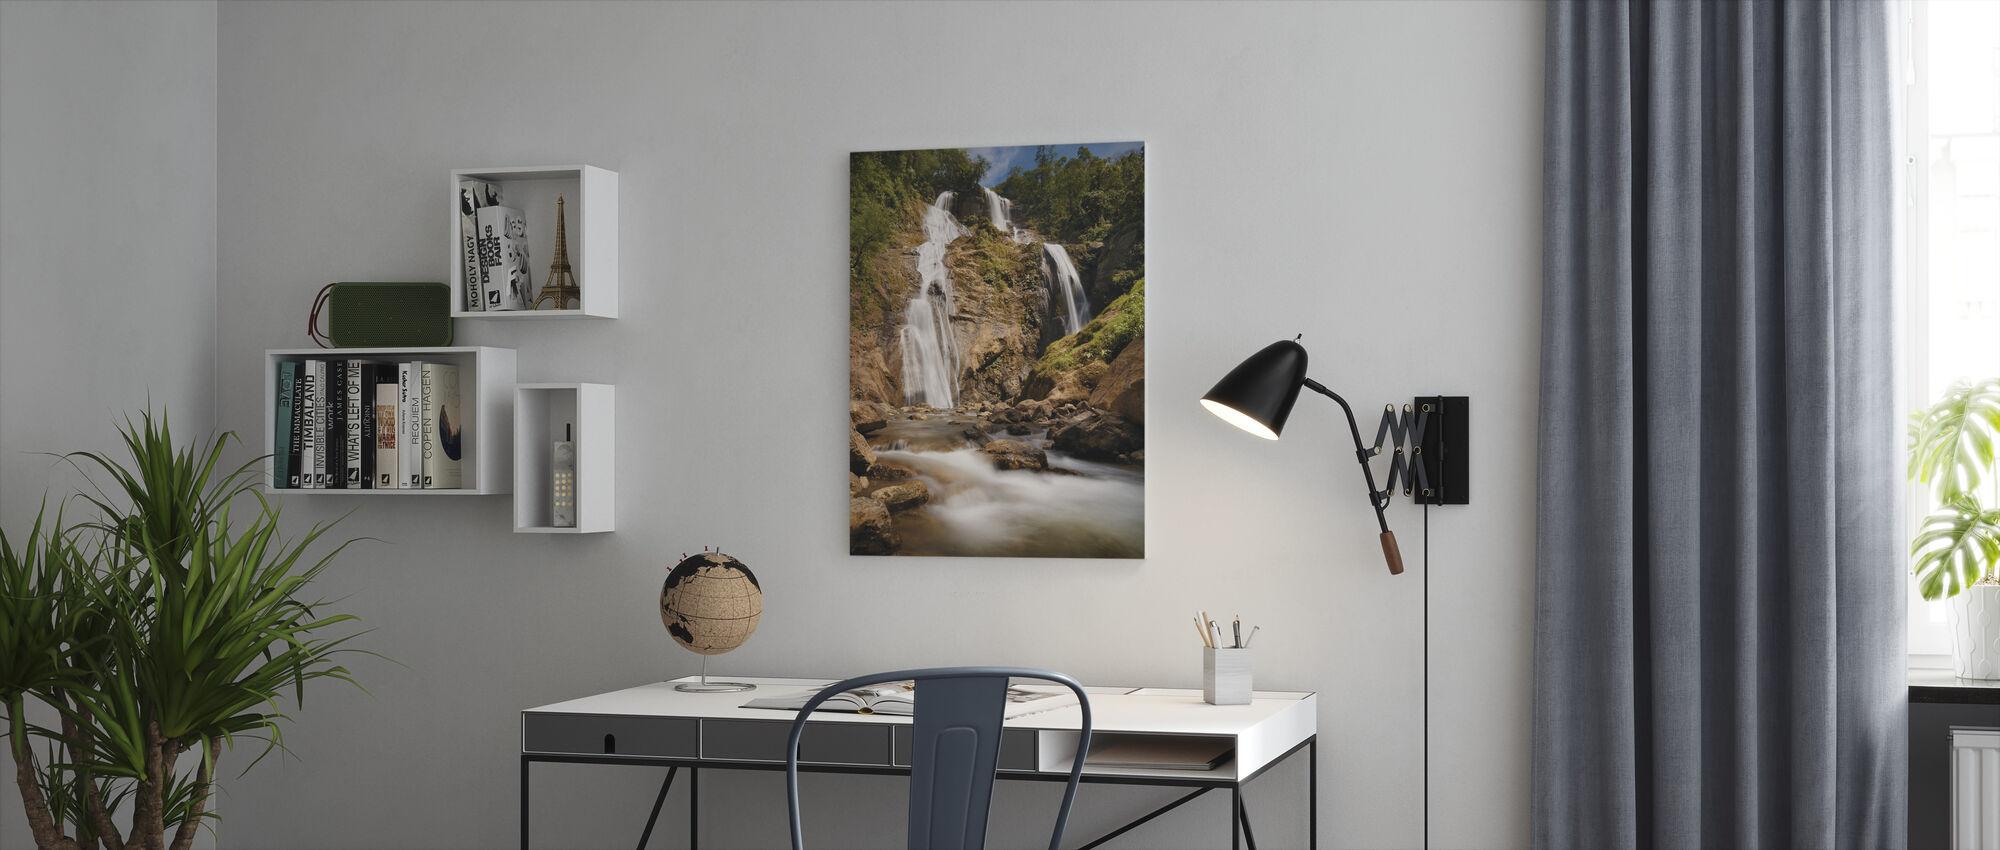 Bani Falls - Lerretsbilde - Kontor